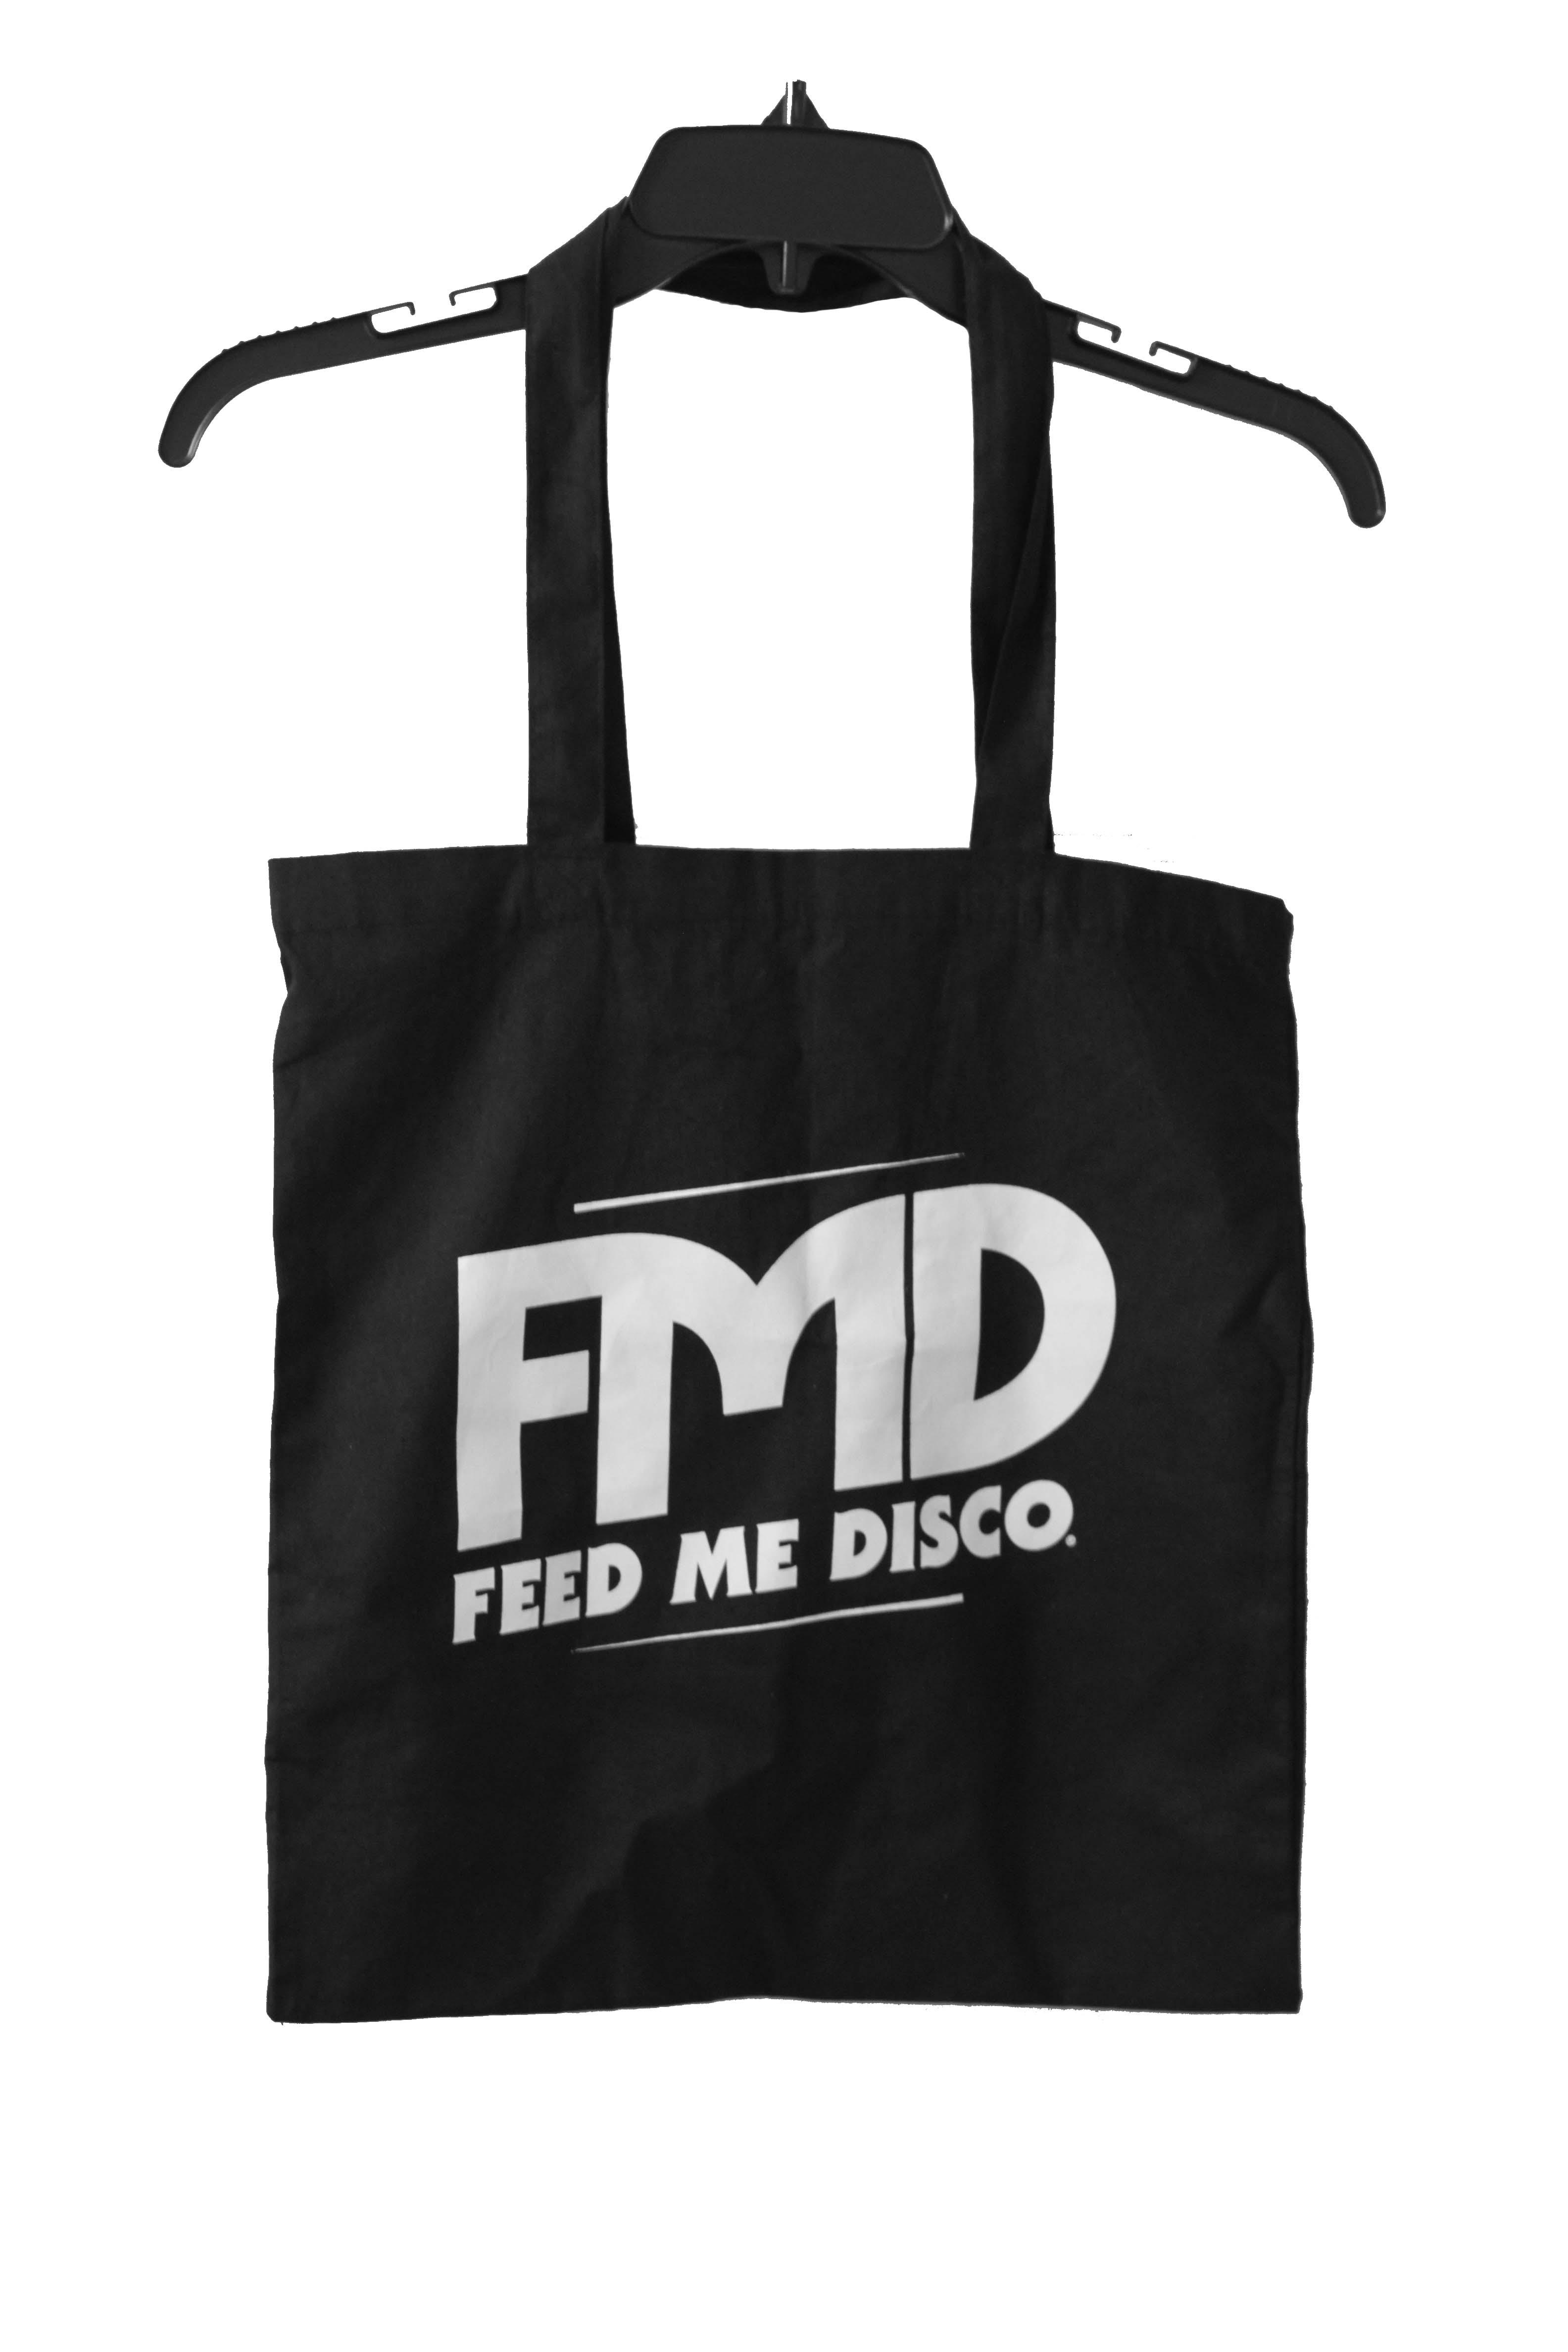 Feed Me Disco Logo Tote.